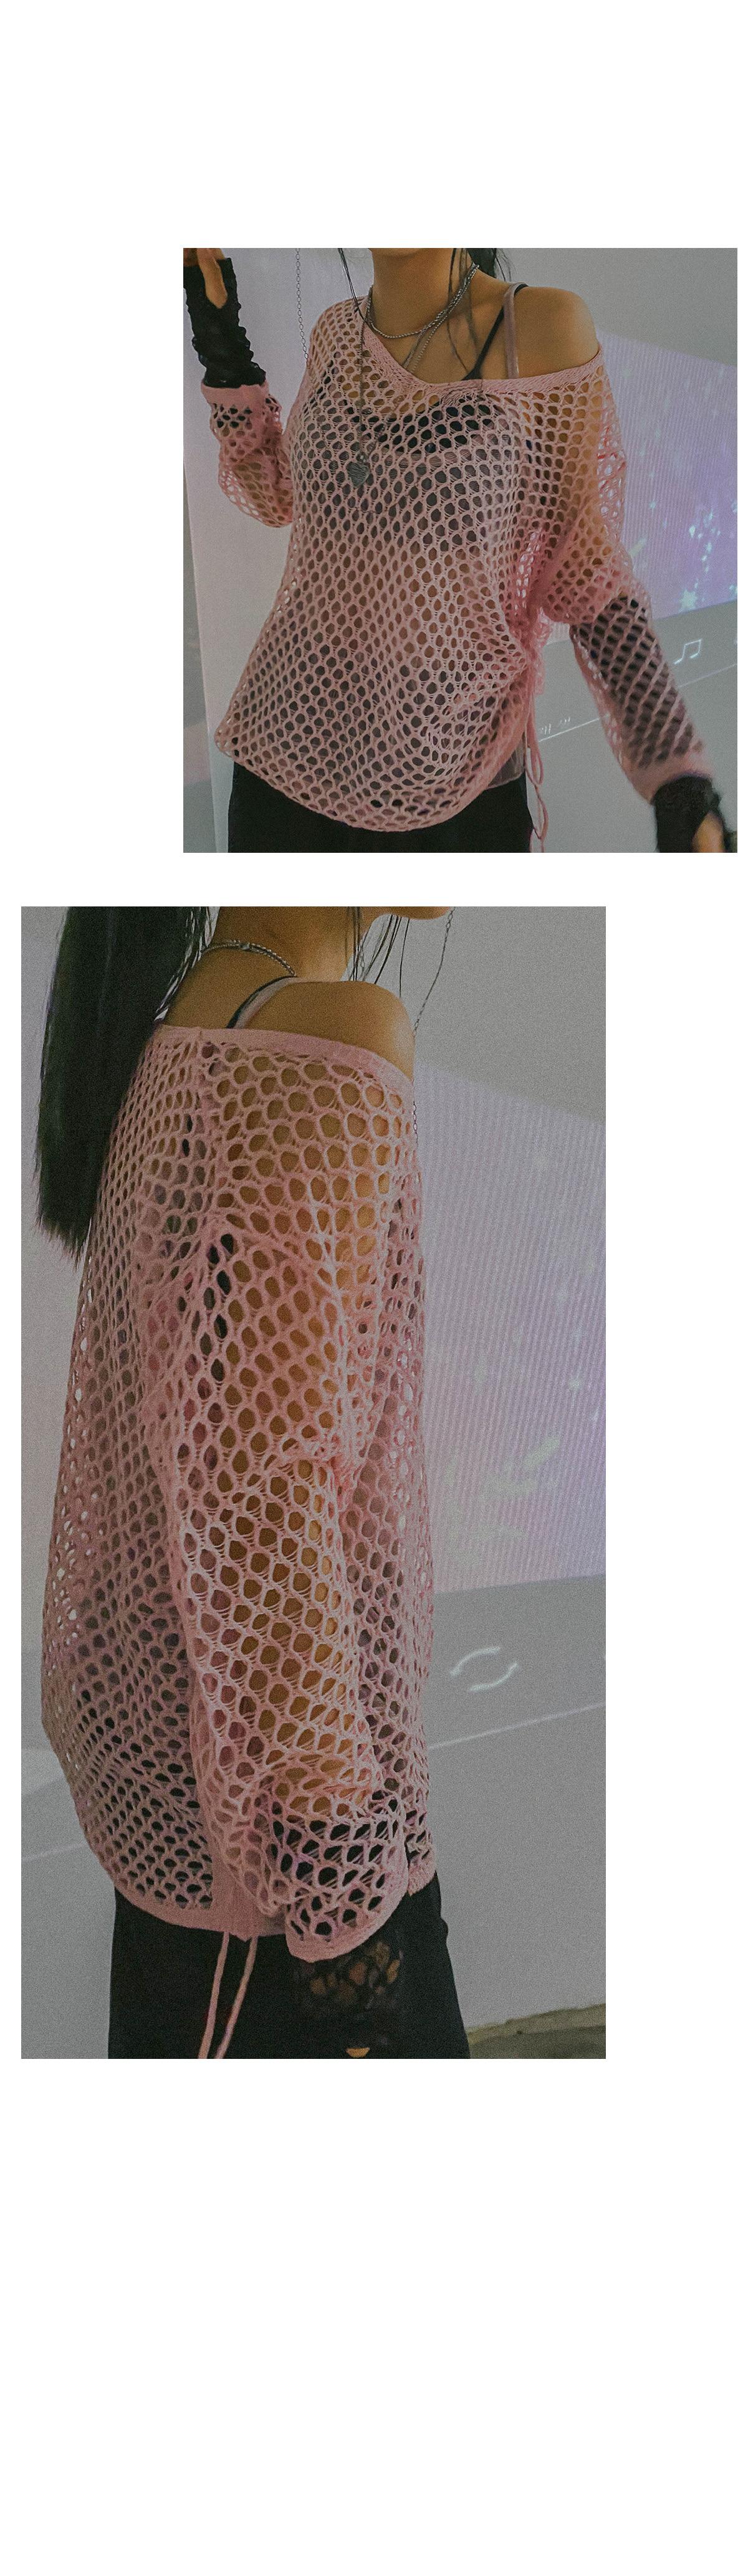 String poly netting